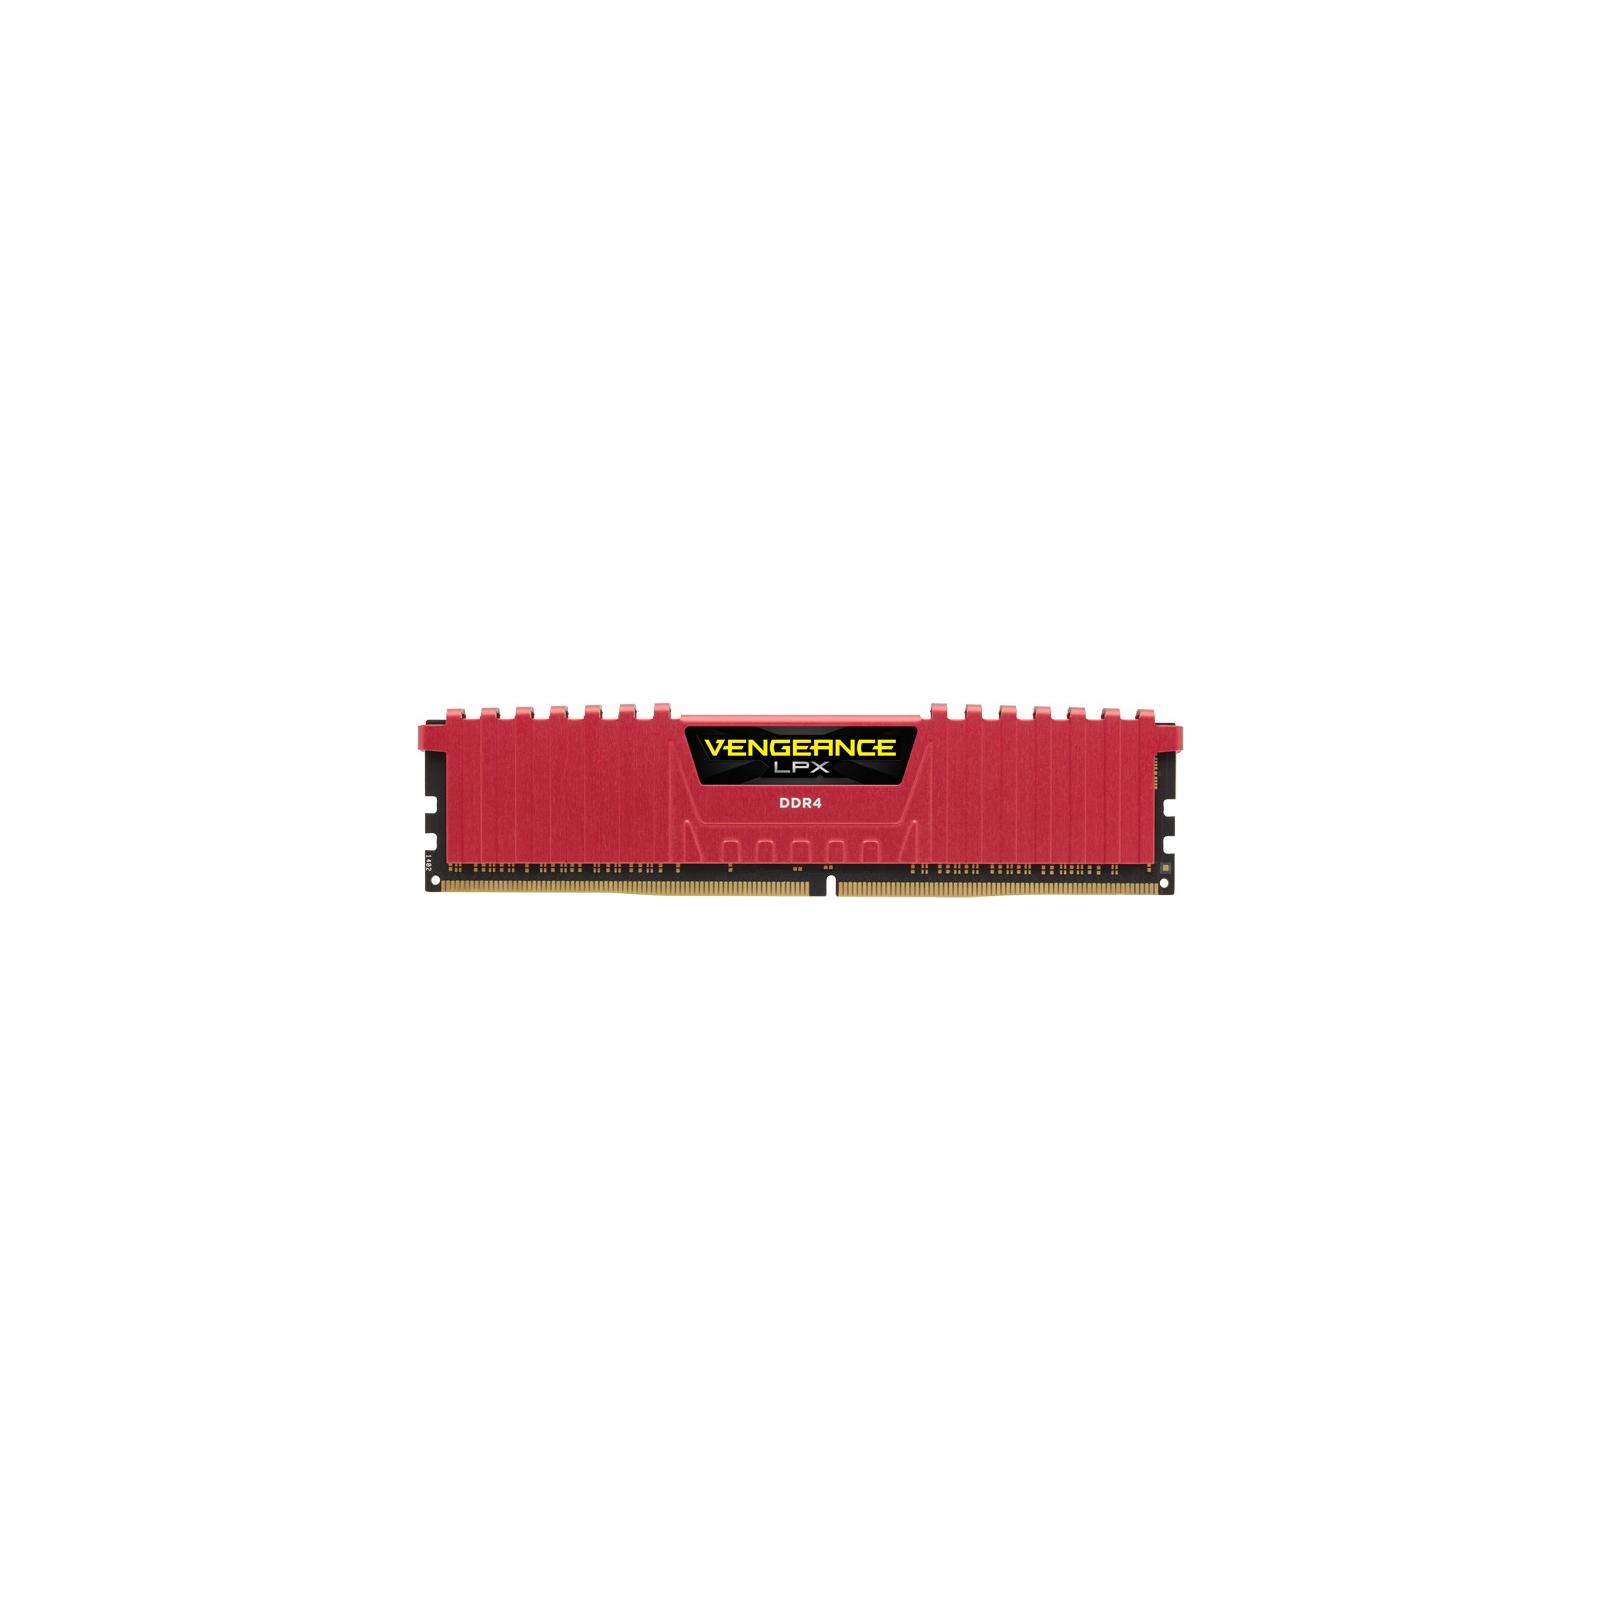 Модуль памяти для компьютера DDR4 8GB 2666 MHz Vengeance LPX Red CORSAIR (CMK8GX4M1A2666C16R)